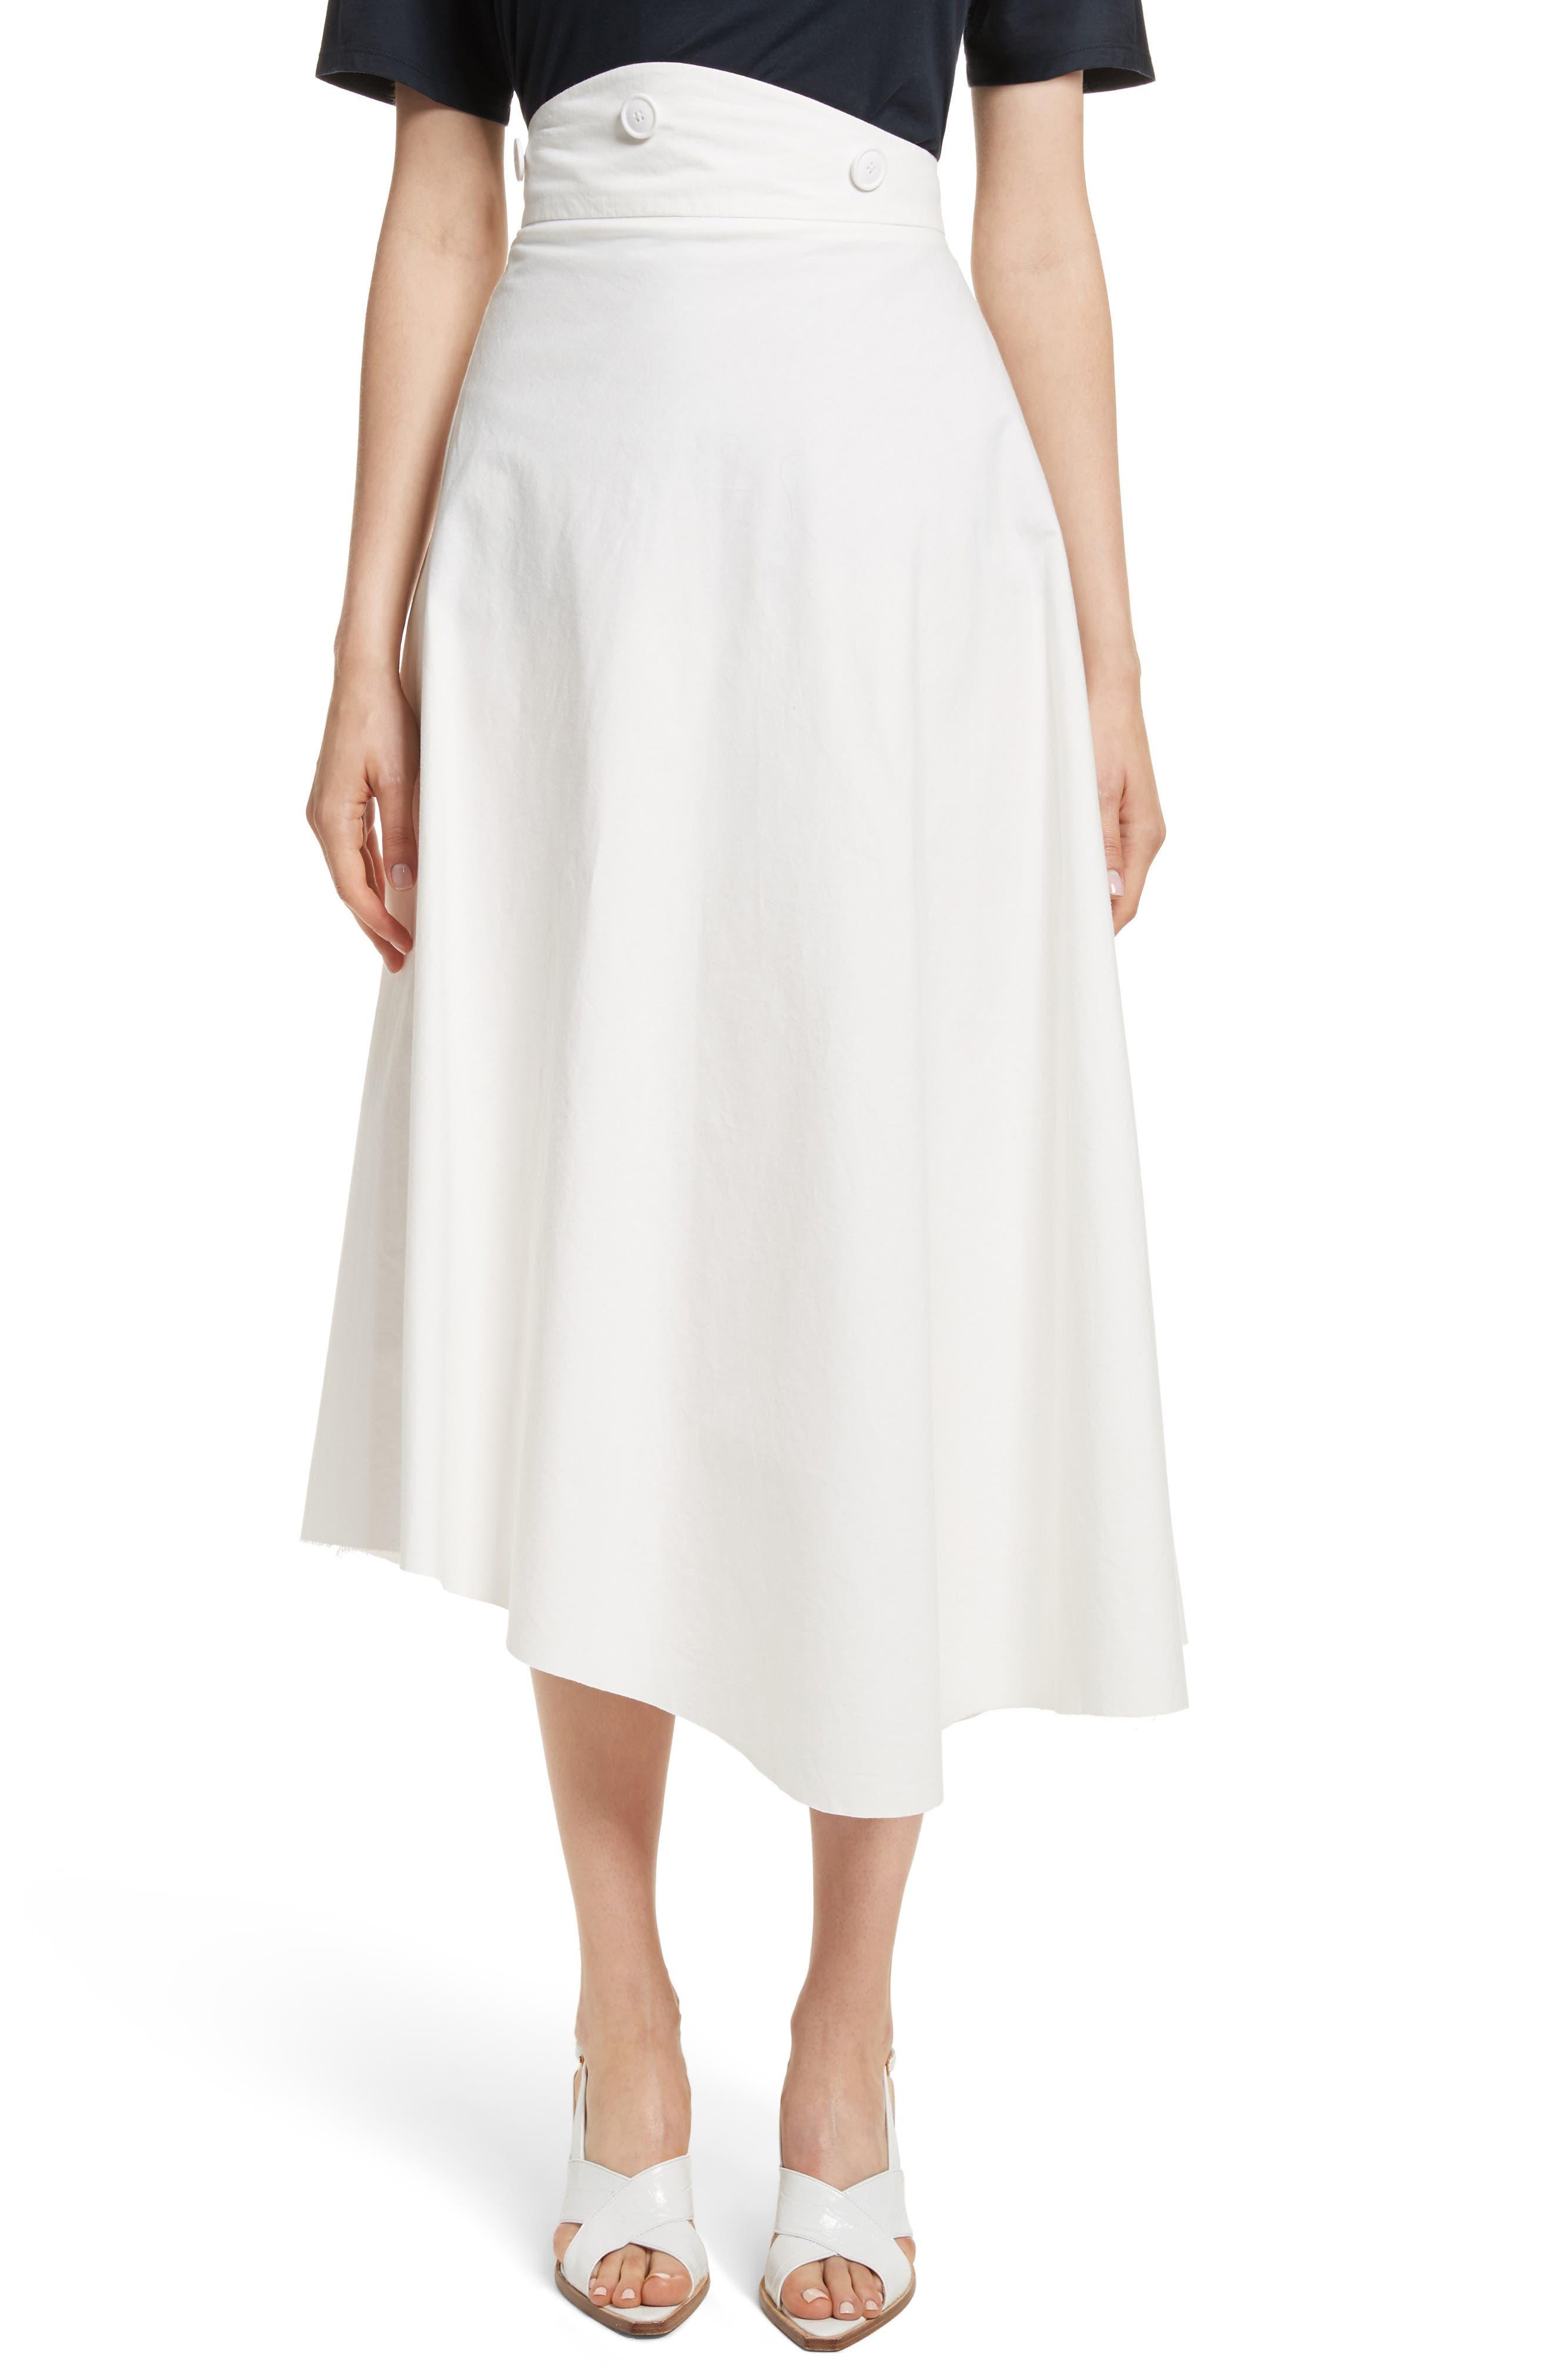 A.W.A.K.E. A-Line Skirt